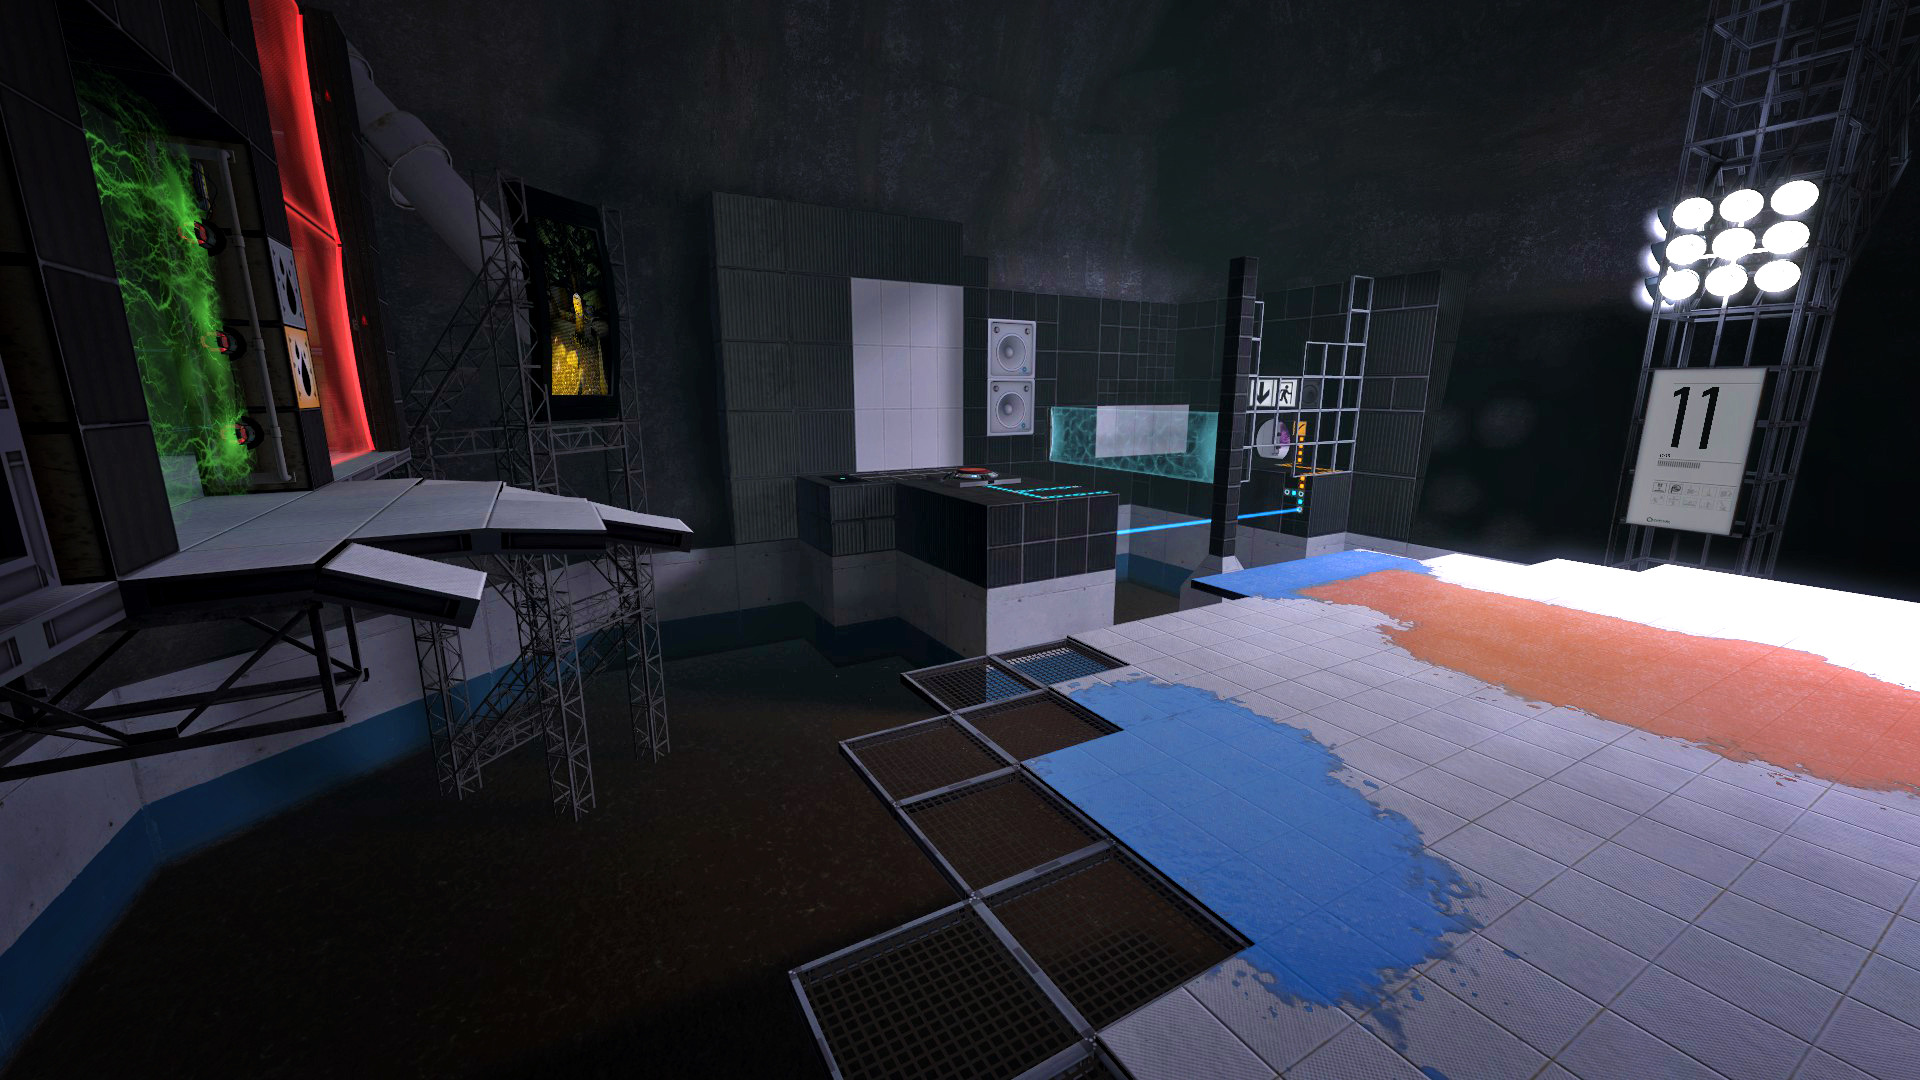 Portal 2 Mod - Aperture Tag The Paint Gun Testing Initiative - Blaues und Rotes Gel